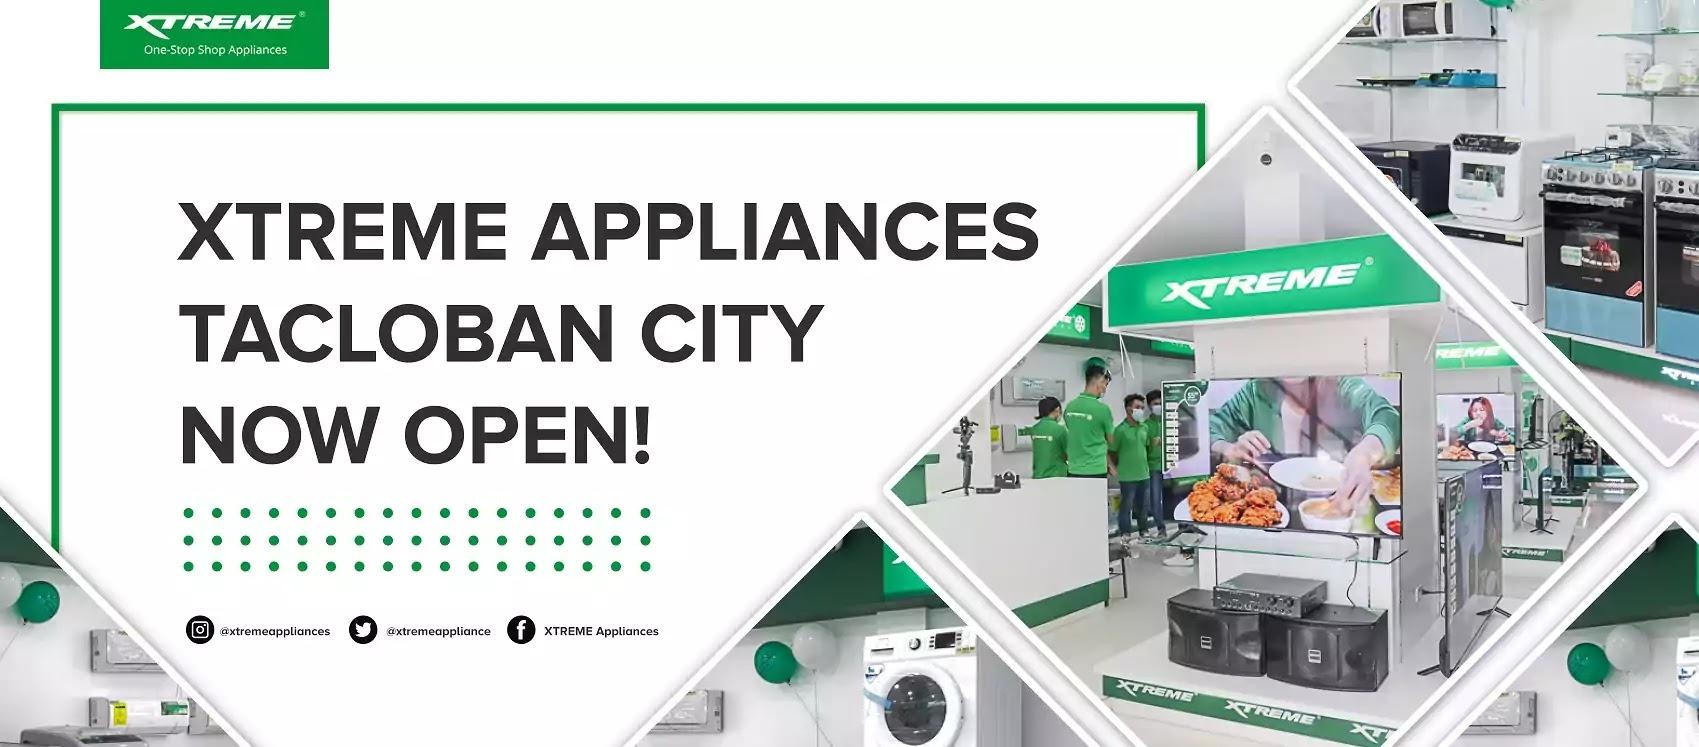 XTREME Appliance Tacloban City Now Open